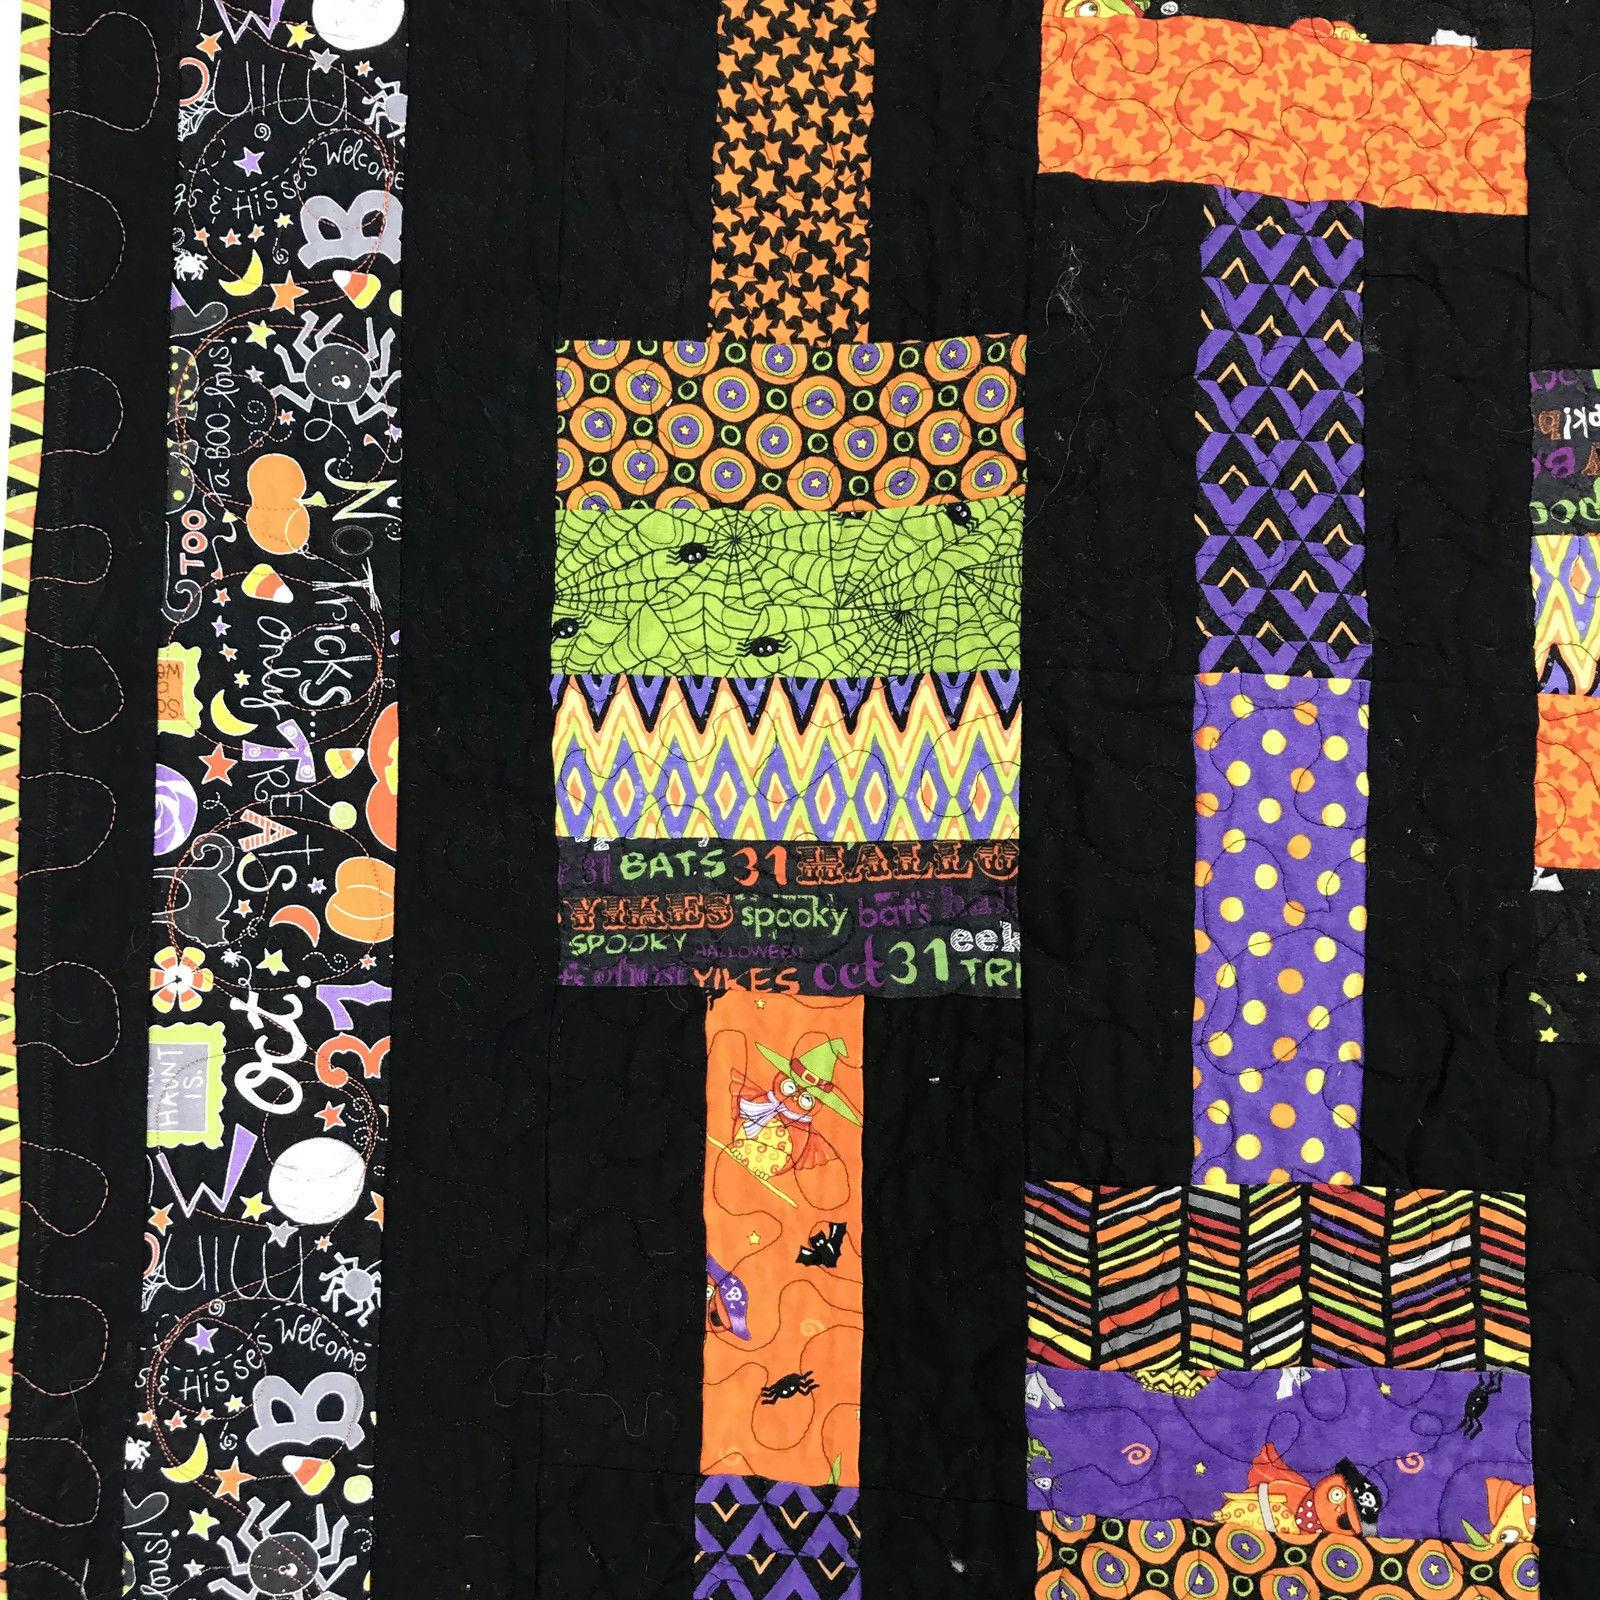 "Halloween Lap Quilt Throw Handmade Cotton Black Orange Purple Prints 50"" by 41"""